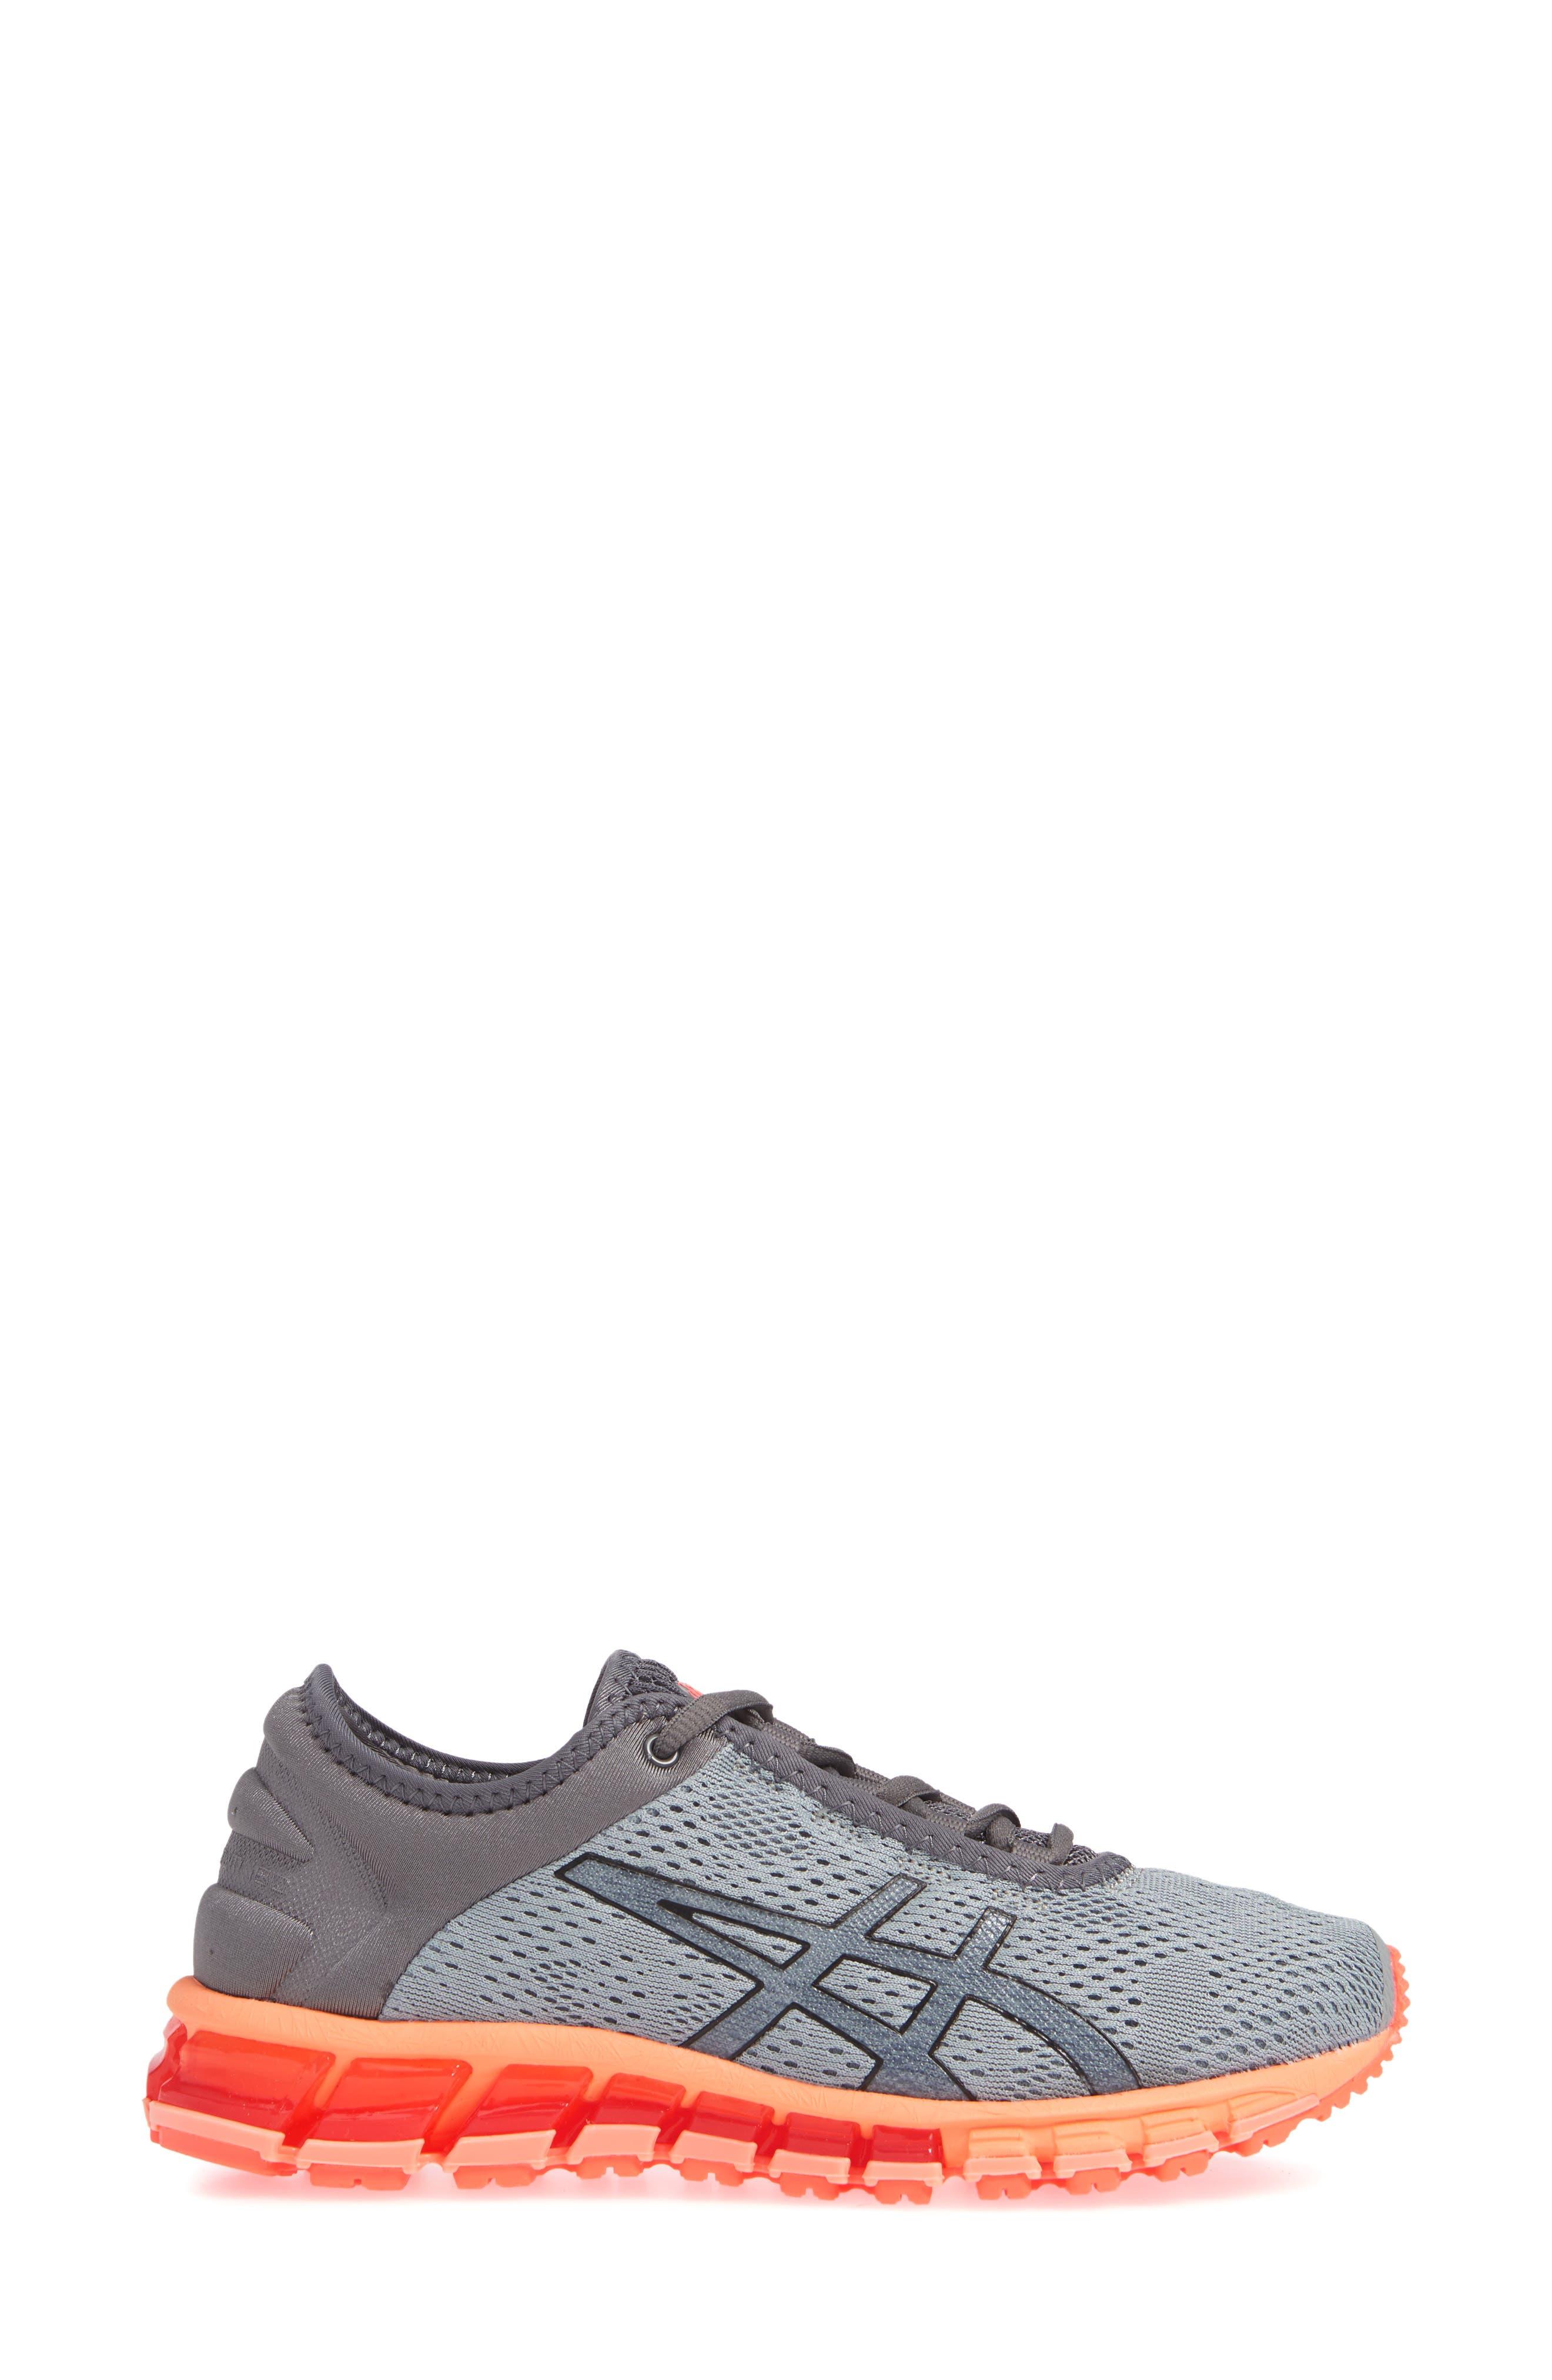 GEL Quantum 180 3 Running Shoe,                             Alternate thumbnail 3, color,                             STONE GREY/ CARBON